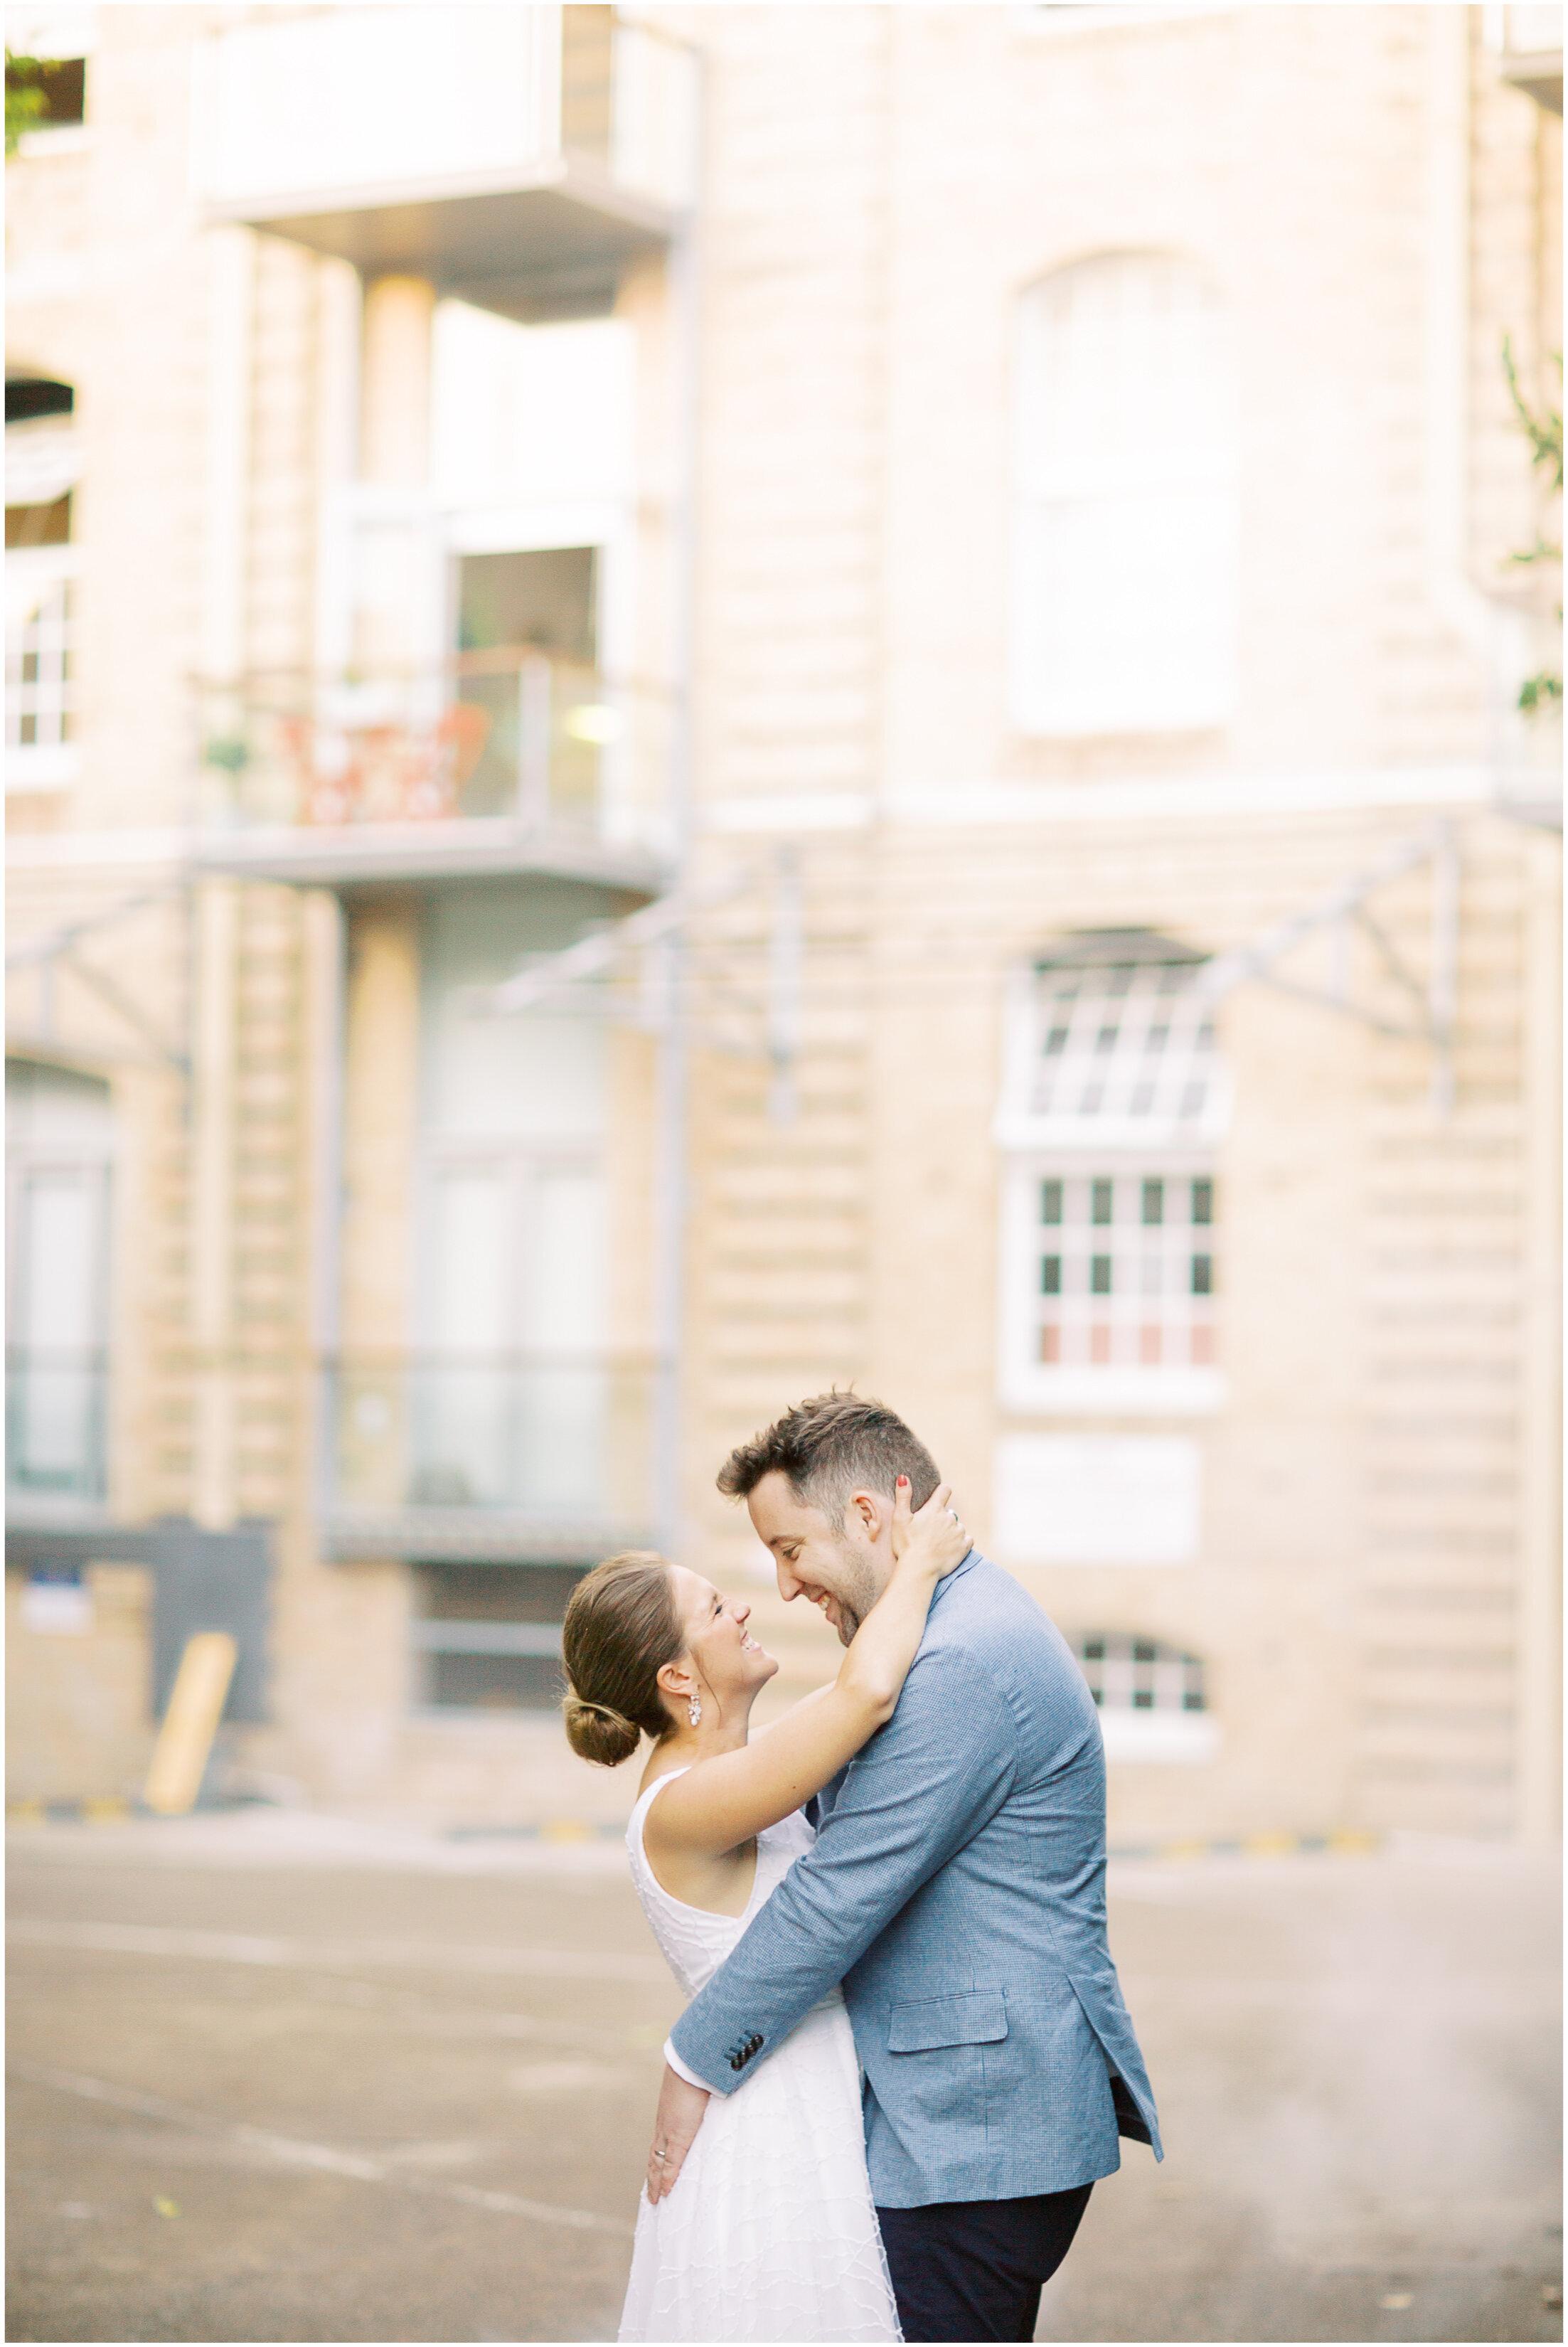 refinery-brisbane-wedding-photography-film-photographer-fine-art-48.jpg